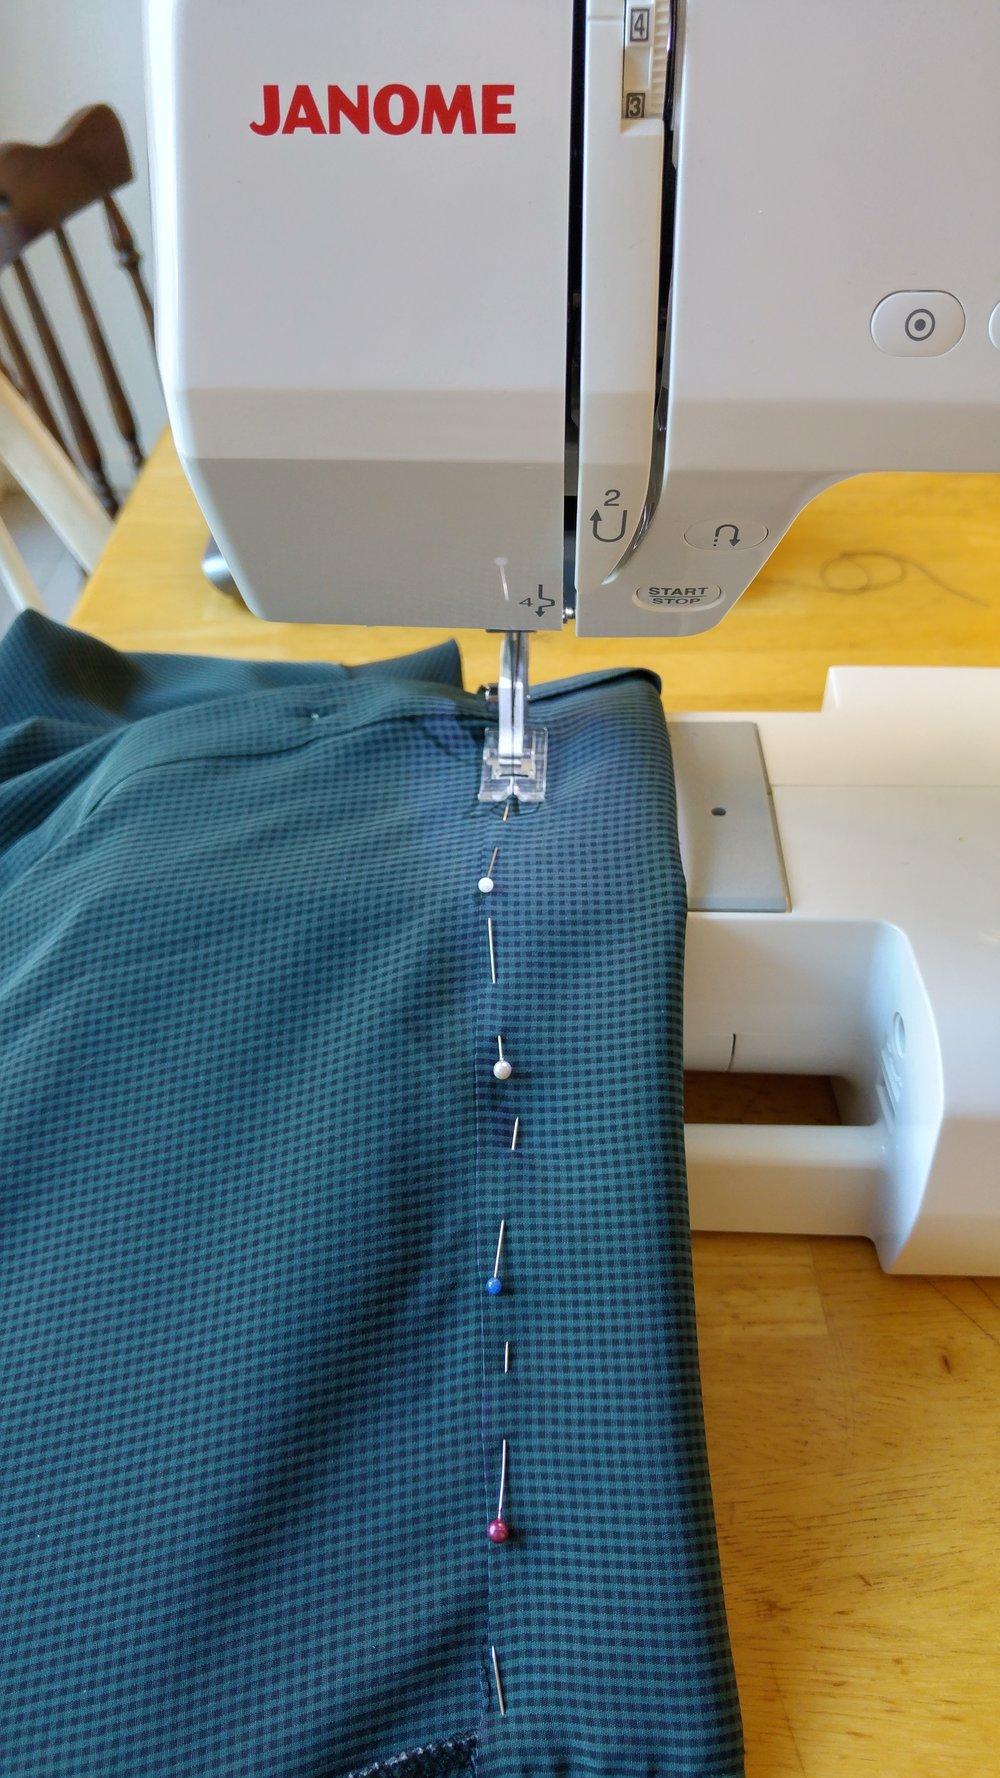 sewing-a-hem